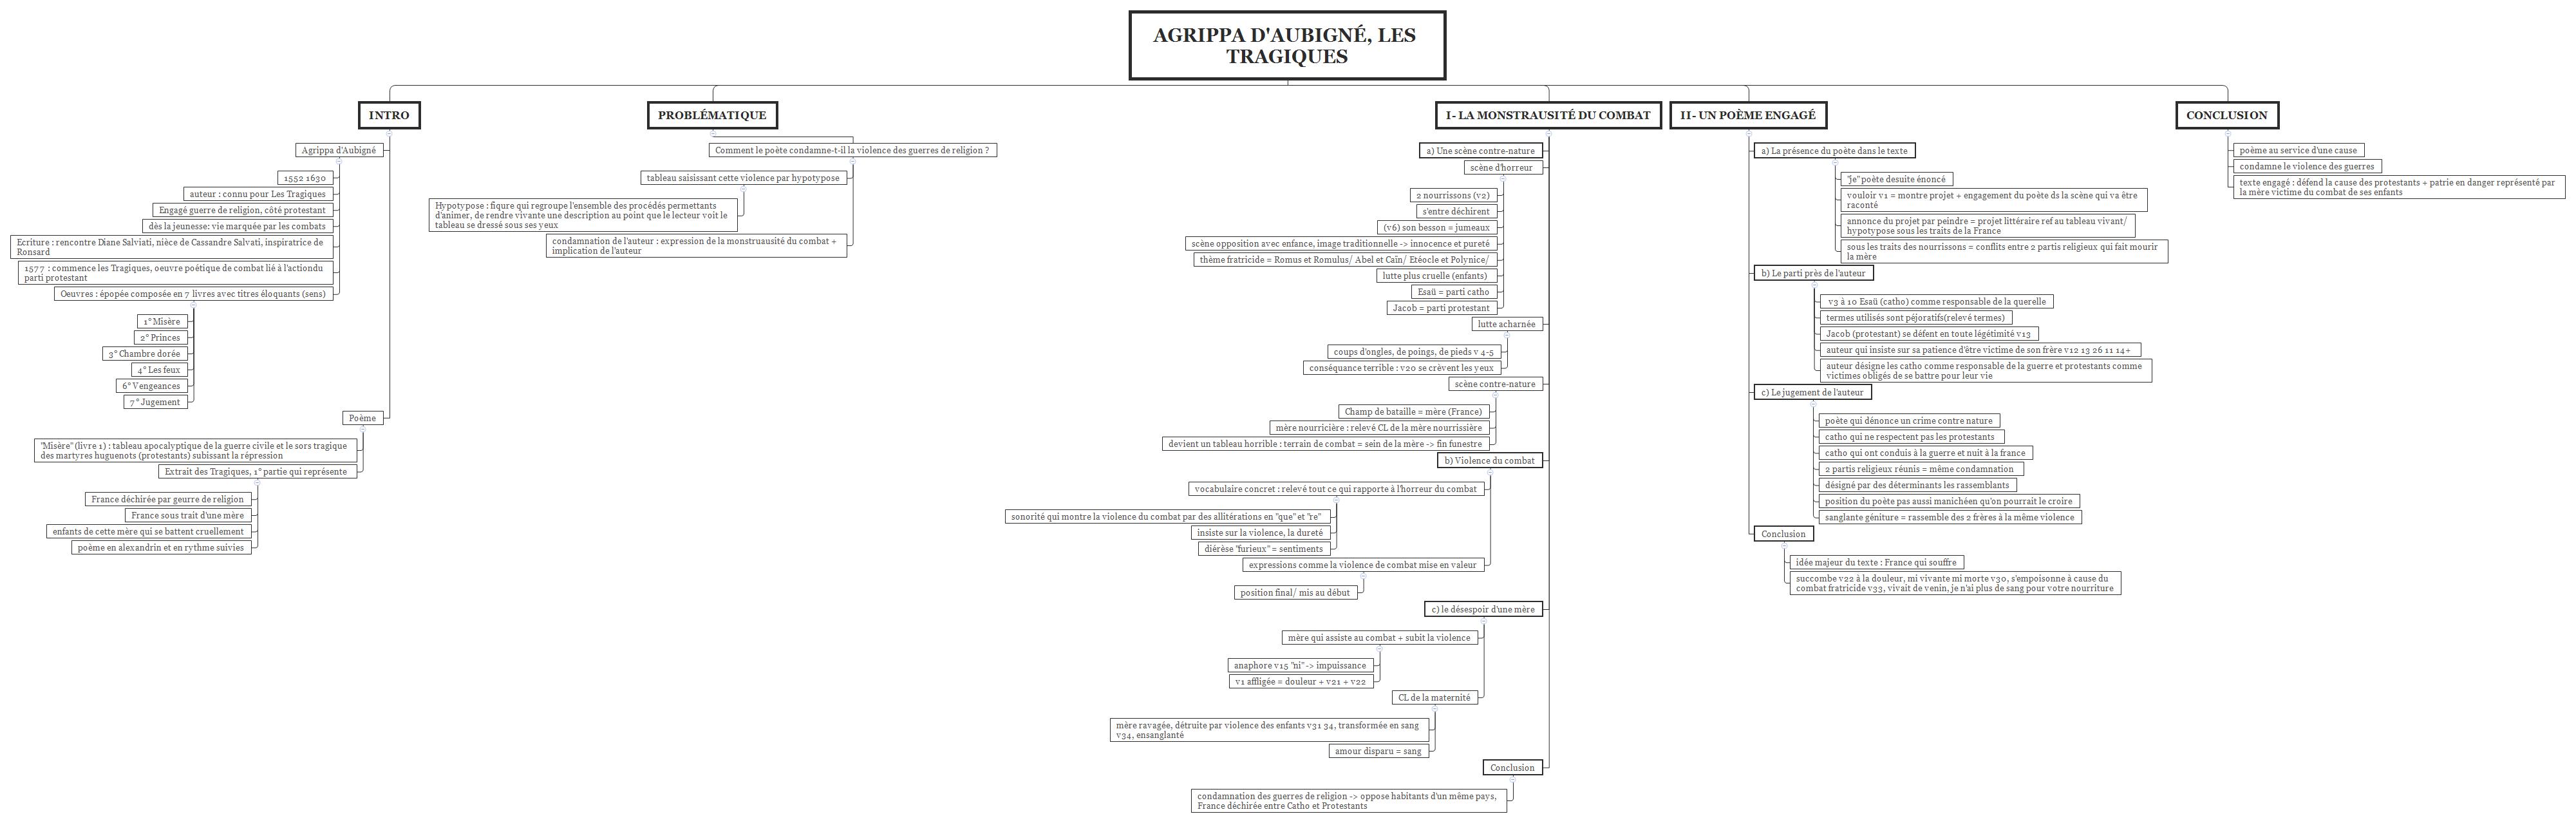 Agrippa Daubigné Les Tragiques Xmind Mind Mapping Software